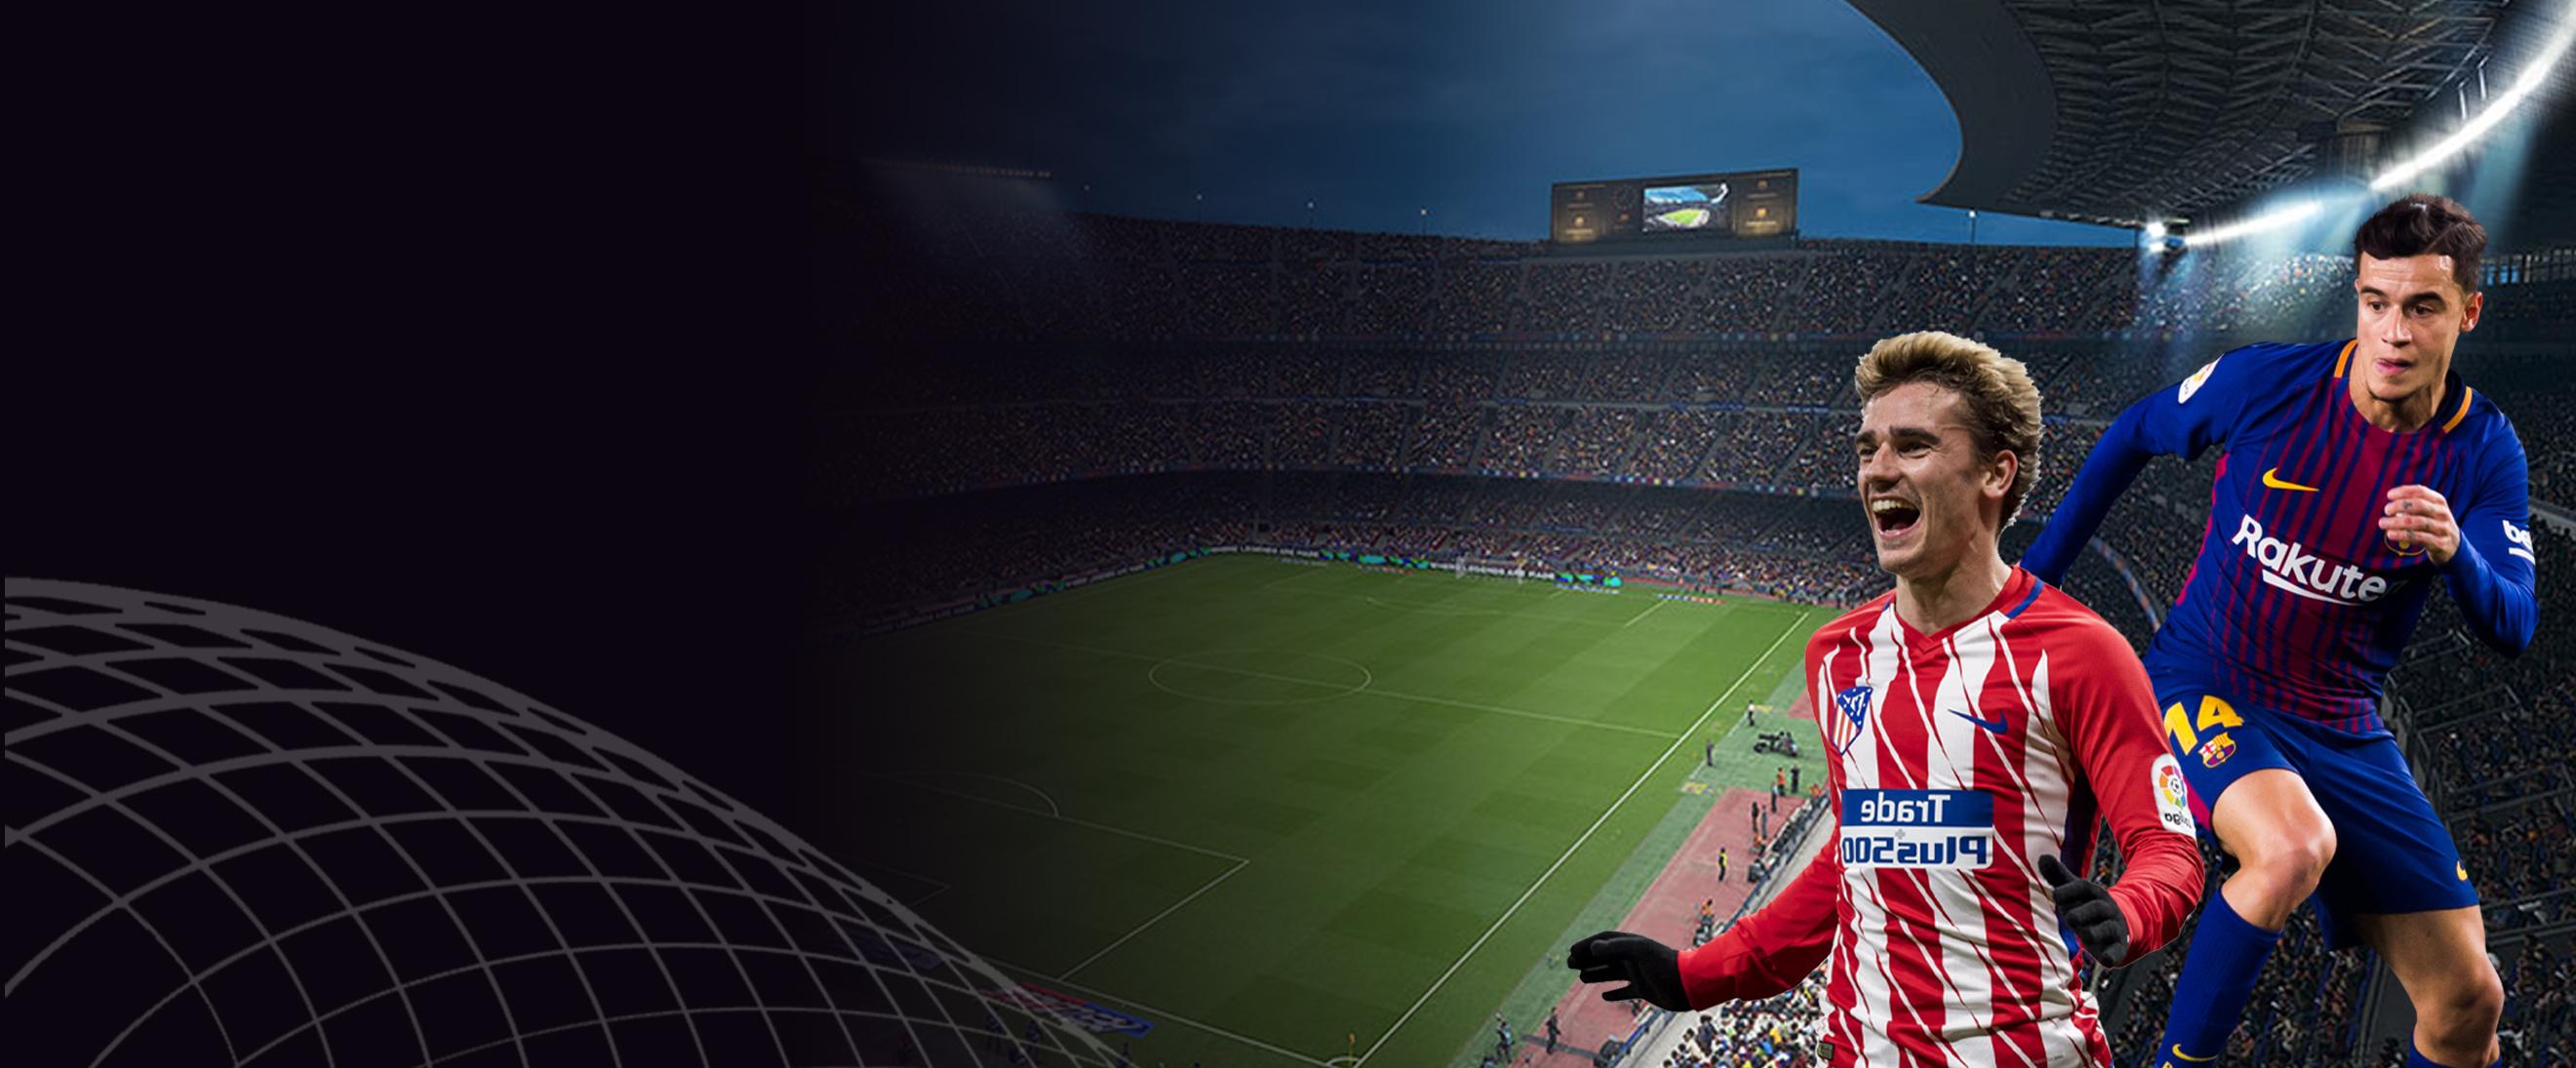 Taruhan Online Sepak Bola Terpercaya Indonesia   BolaBuka